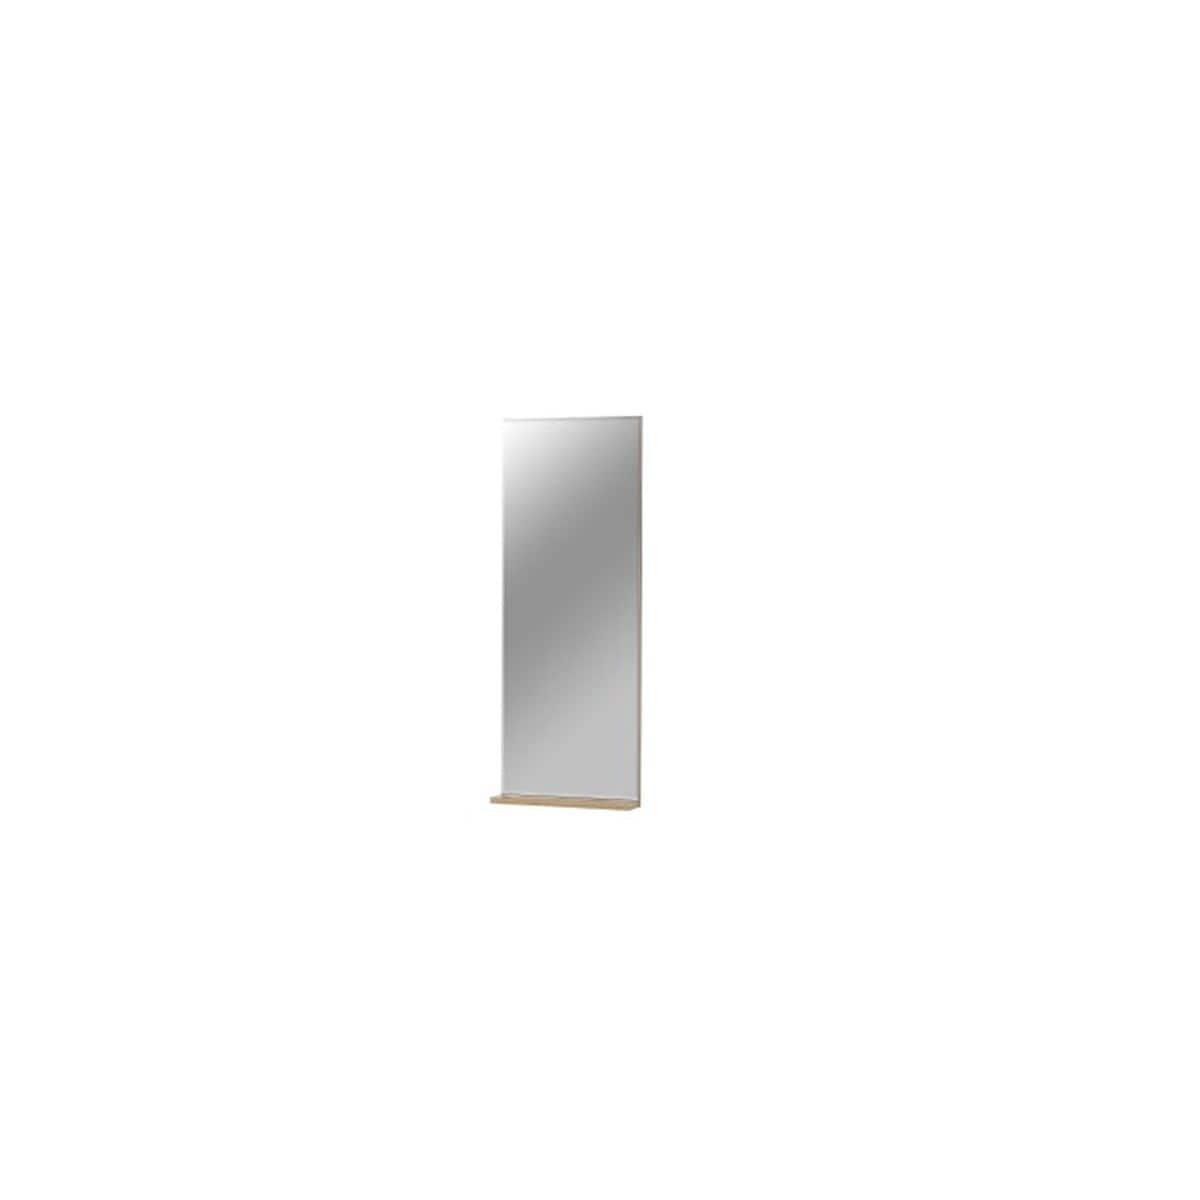 vito spiegel duett porta porta m bel onlineshop. Black Bedroom Furniture Sets. Home Design Ideas